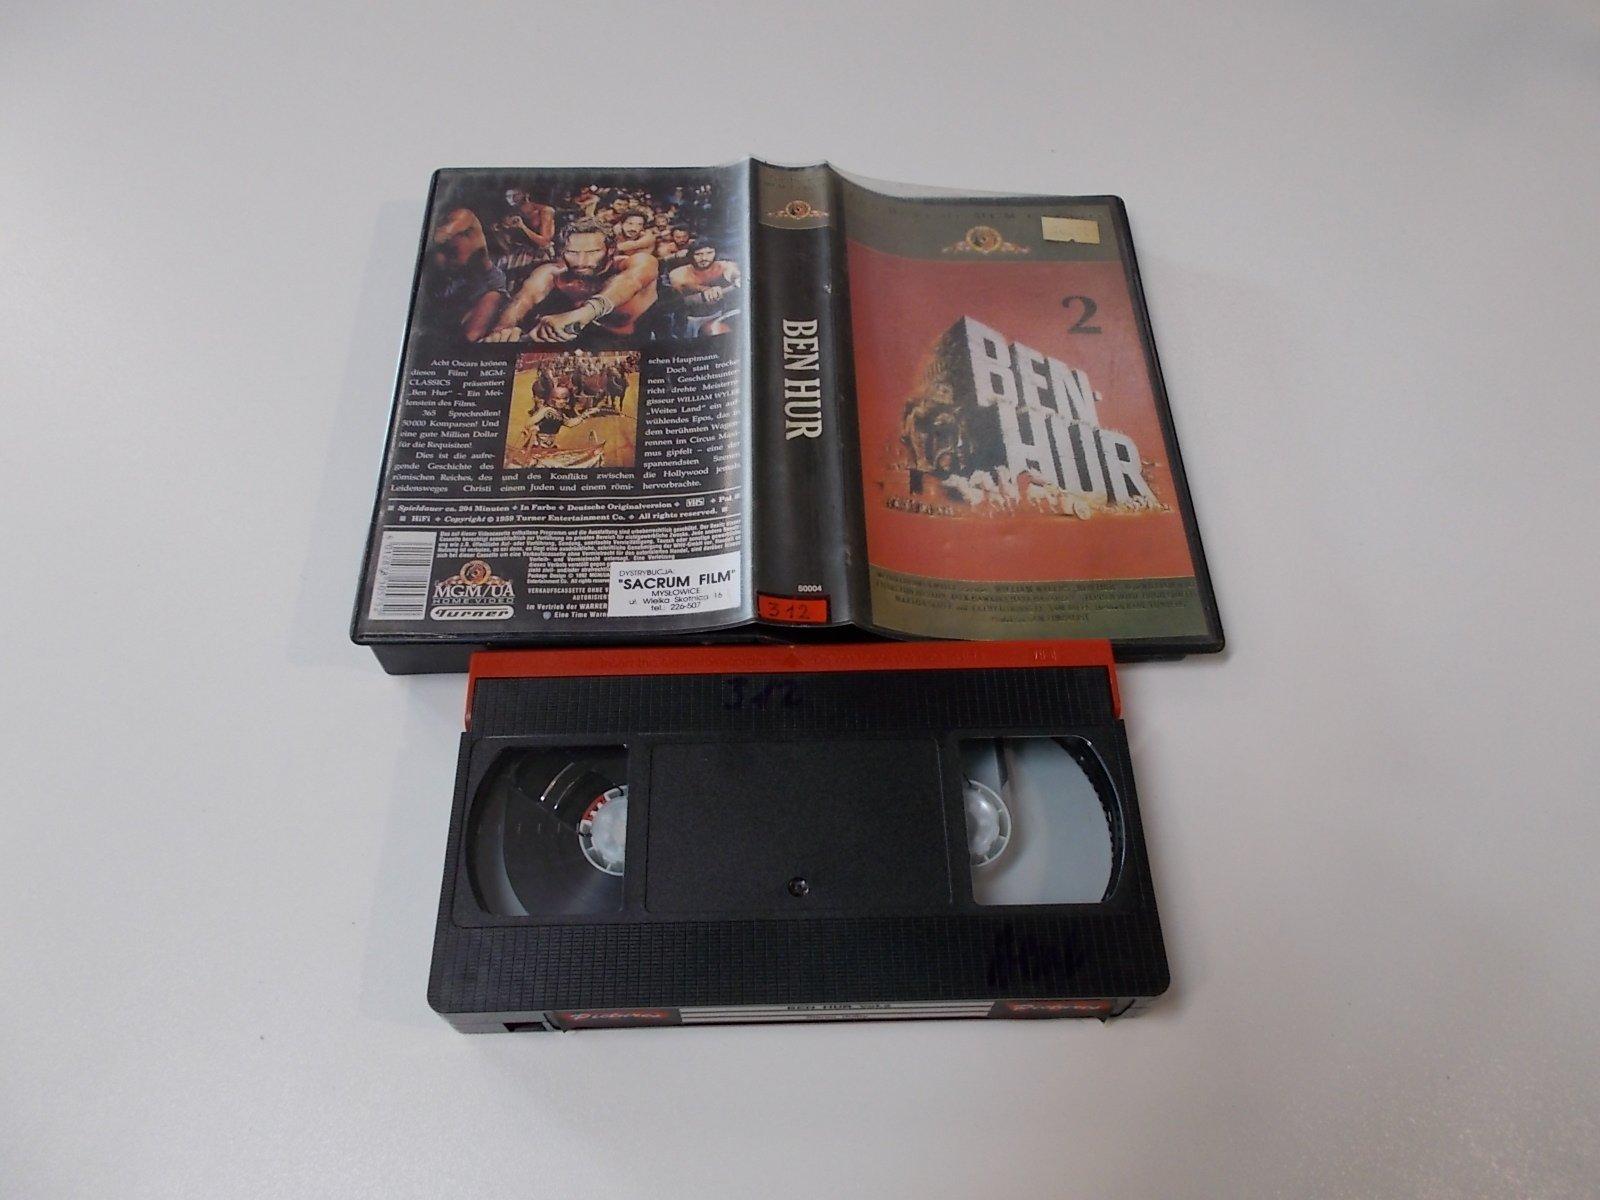 BEN HUR - VHS Kaseta Video - Opole 1673